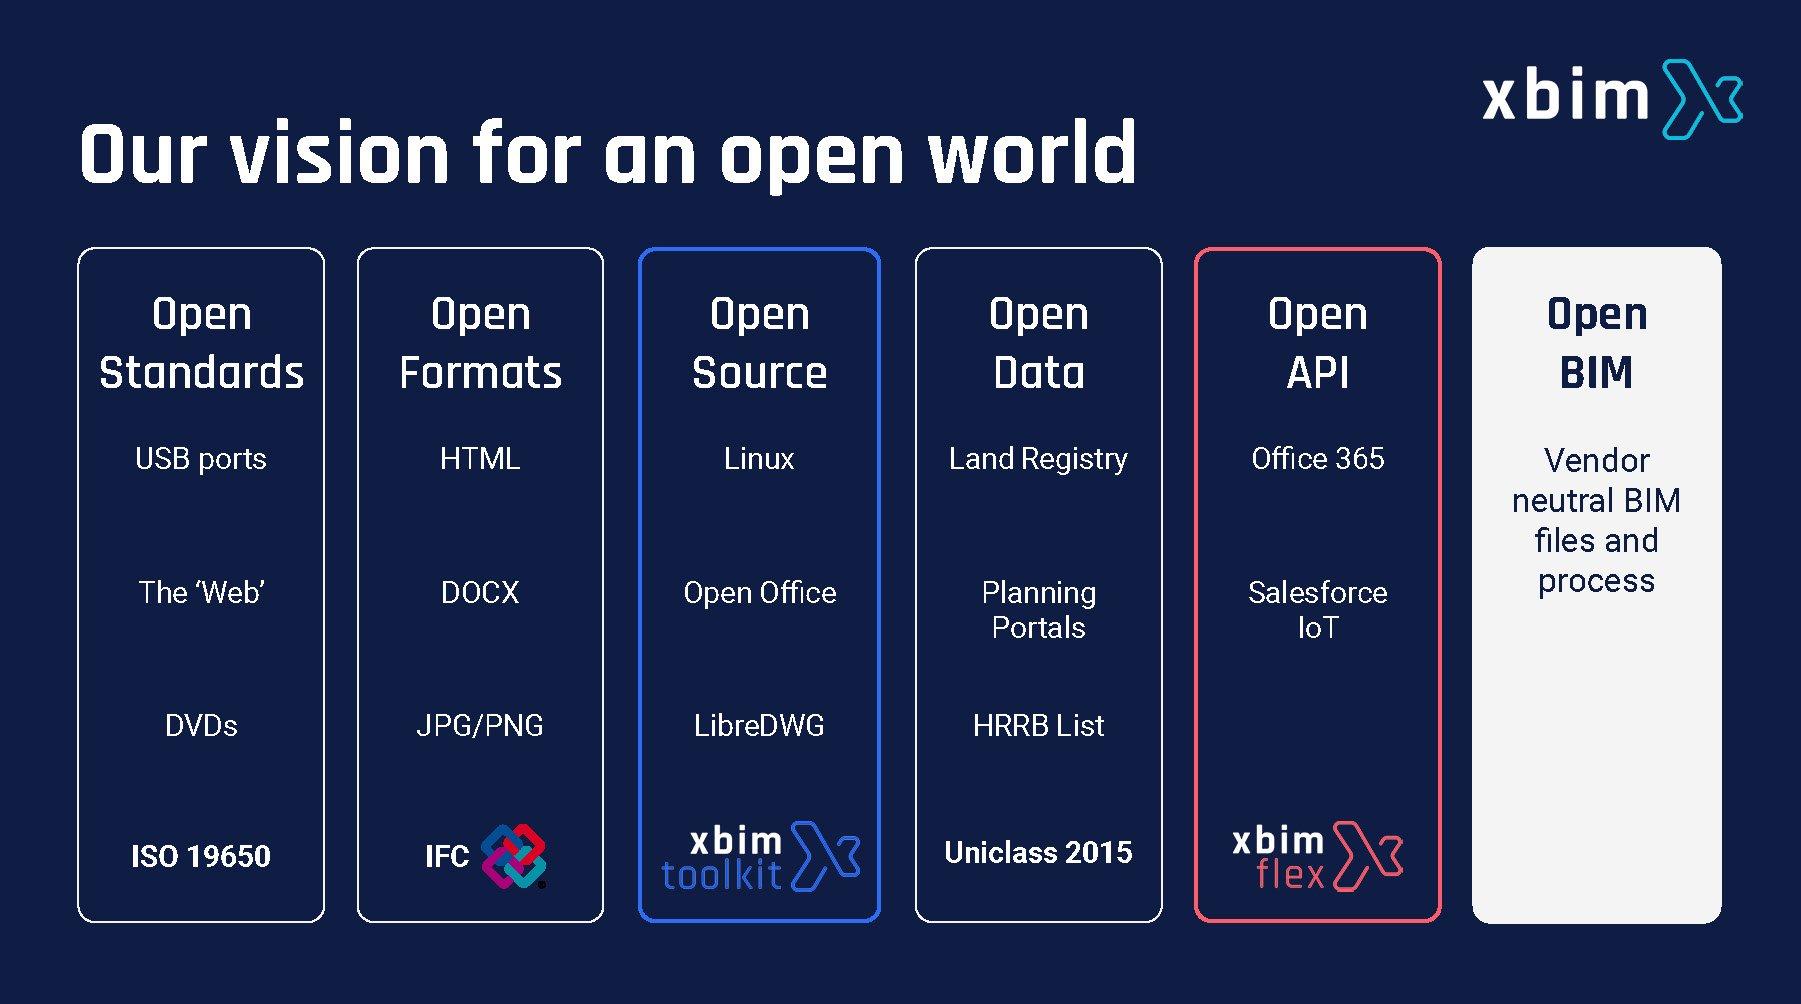 xbim's open vision